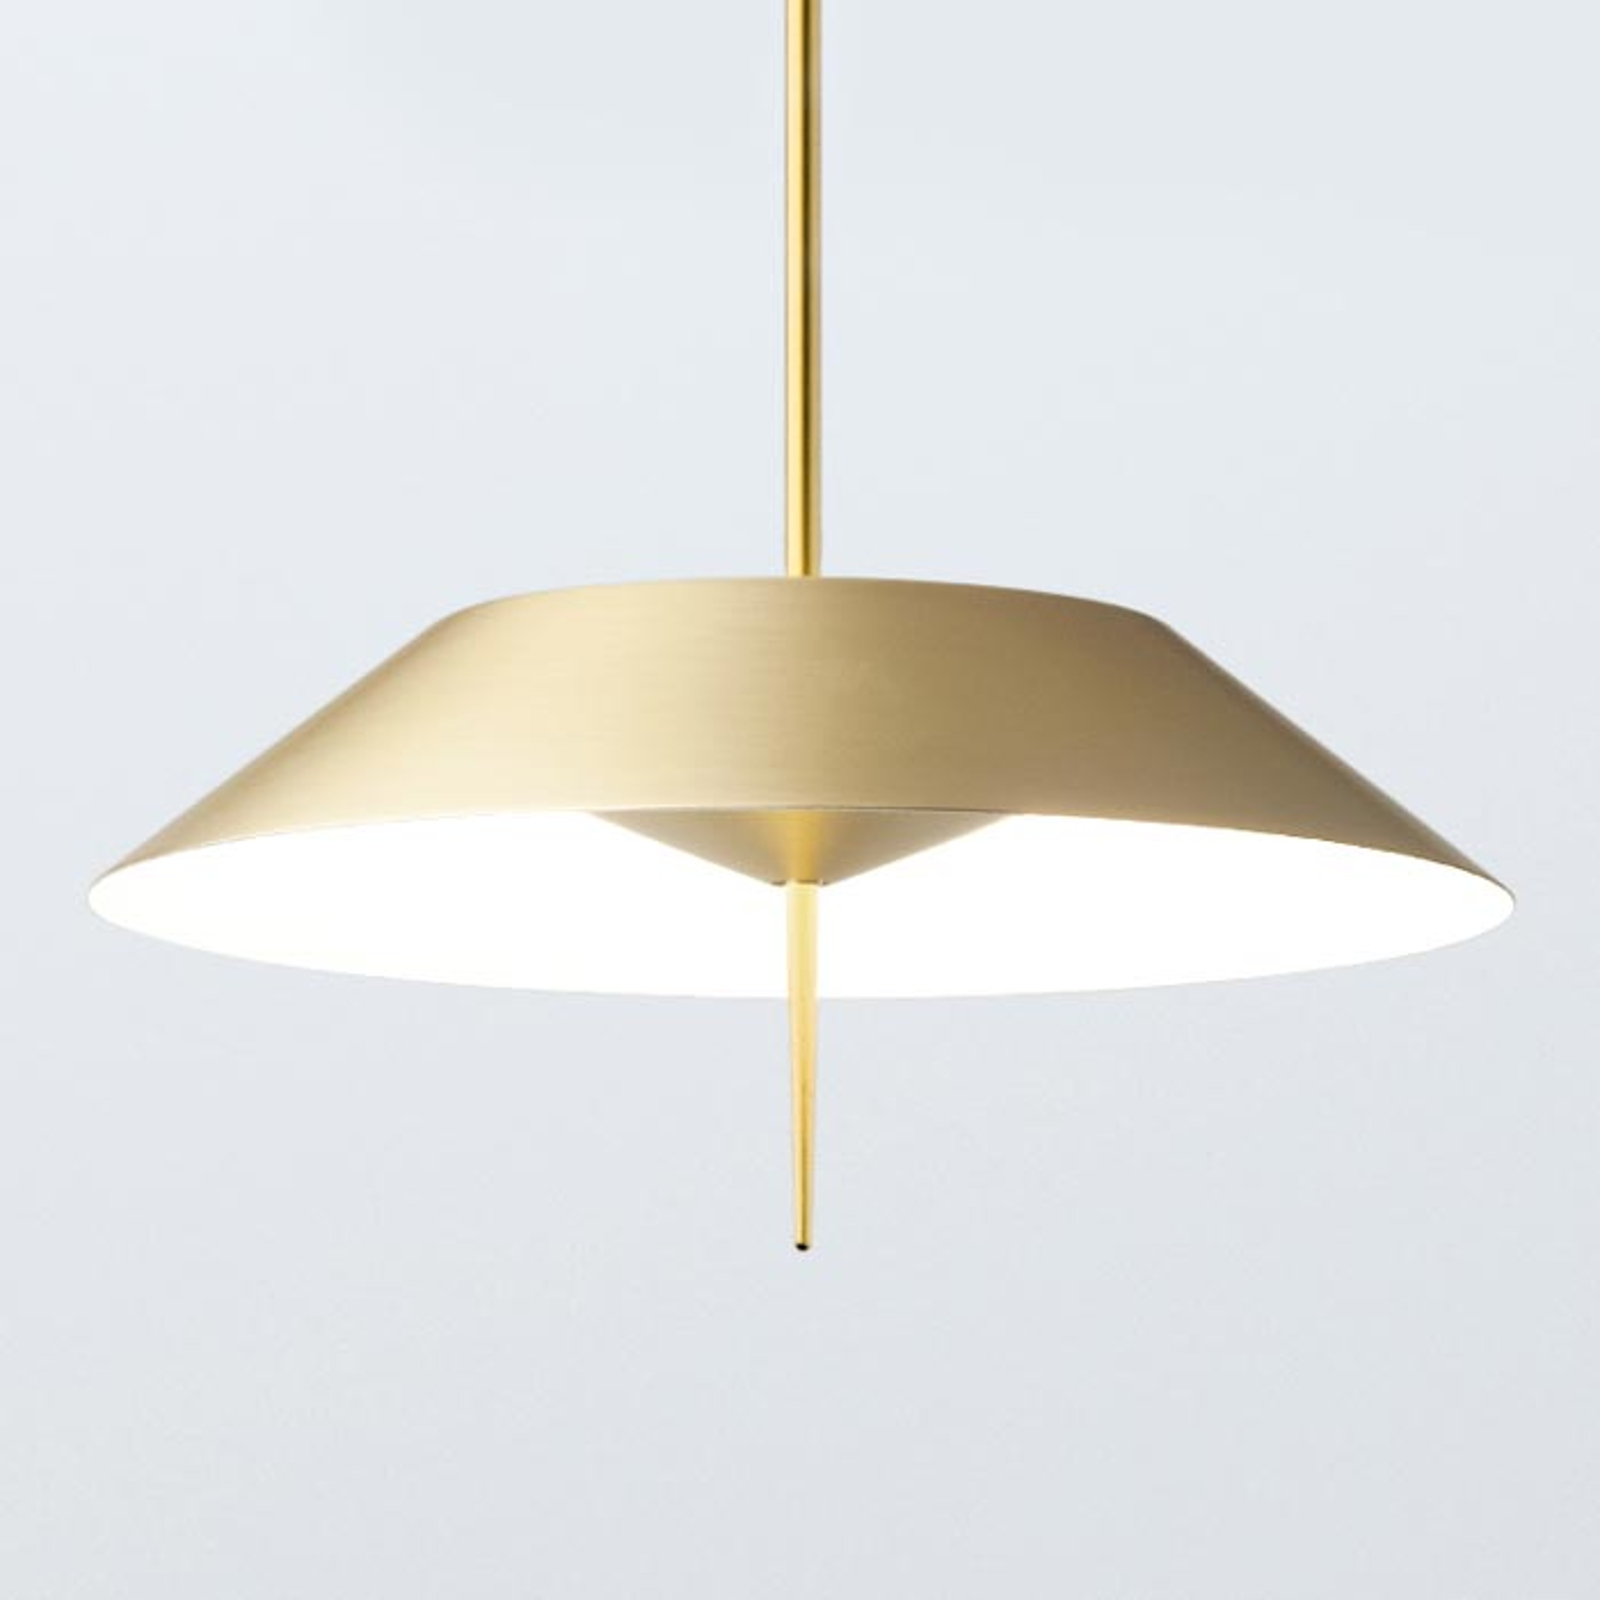 Mayfair - een moderne hanglamp met led's